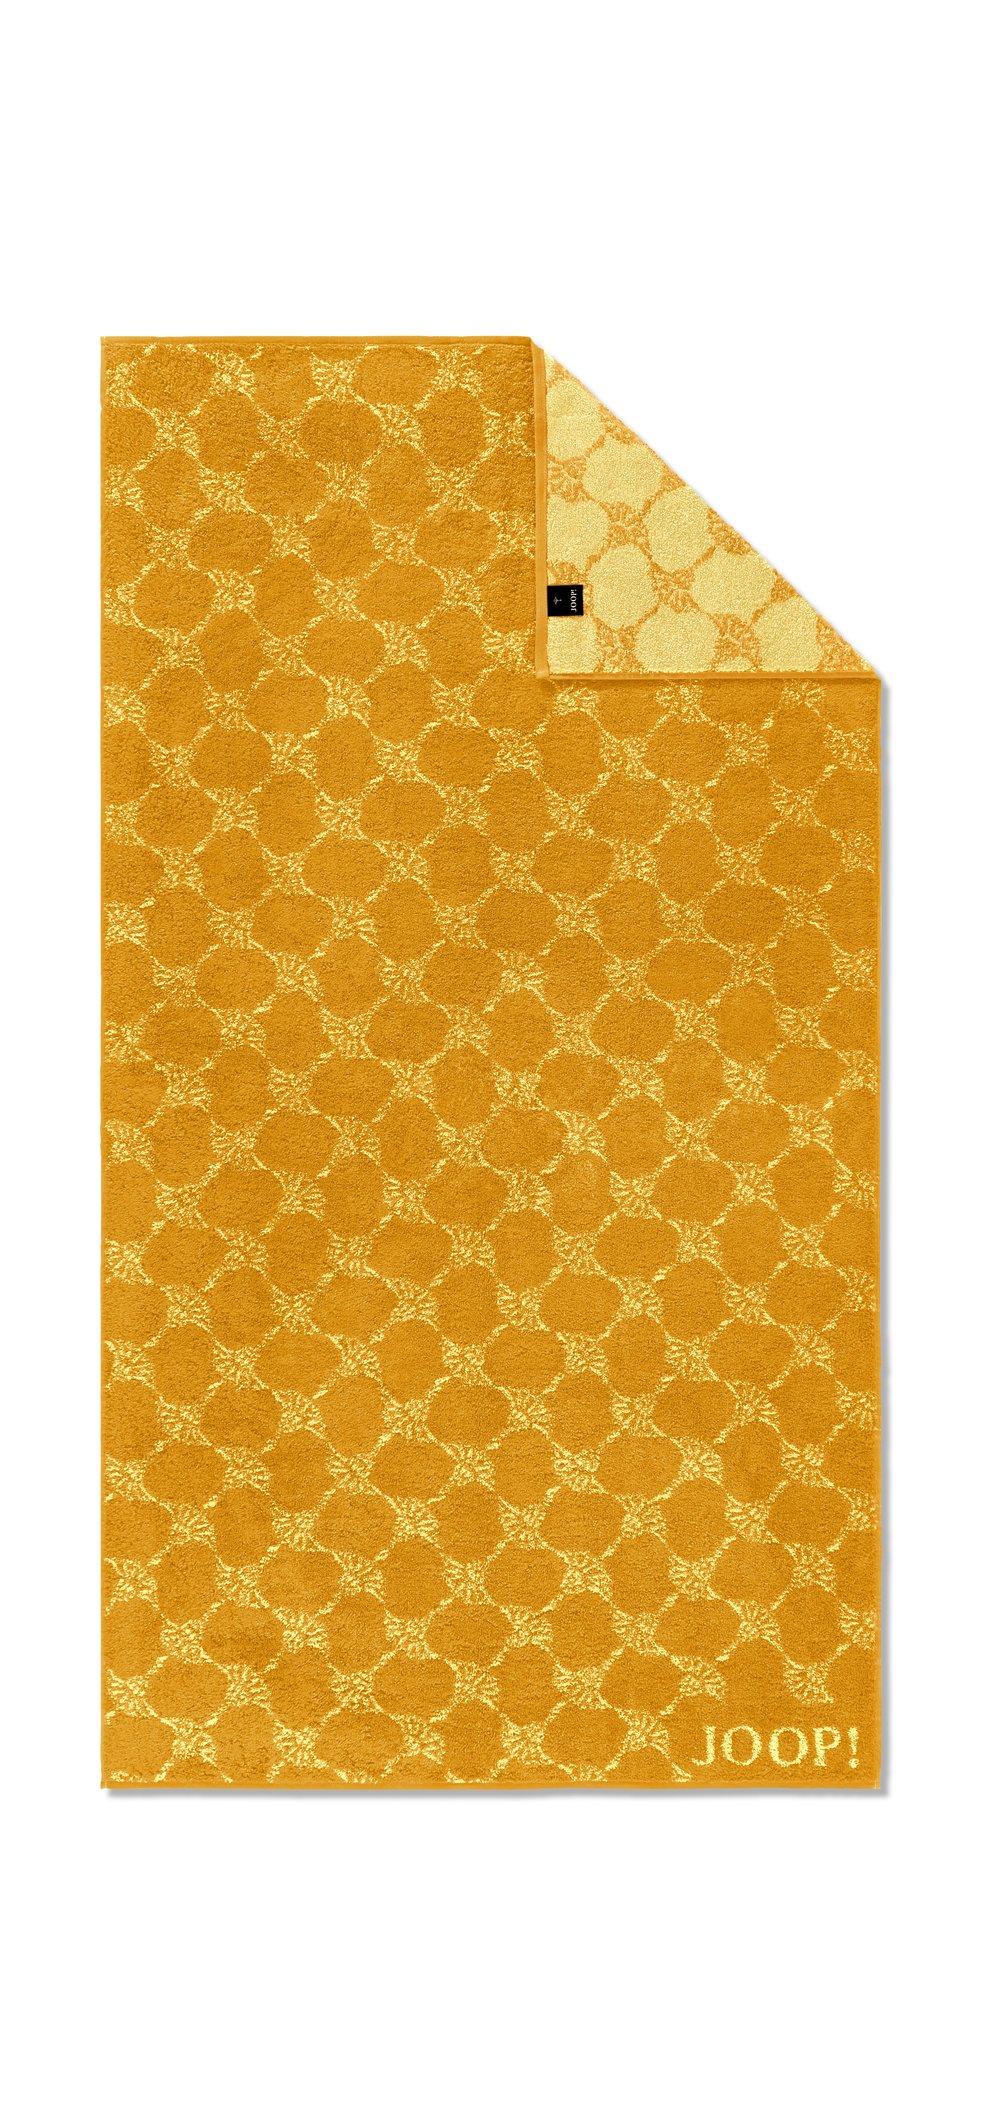 JOOP! Cornflower 1611-50 Honig Duschtuch 80x150 cm Kollektion 2020